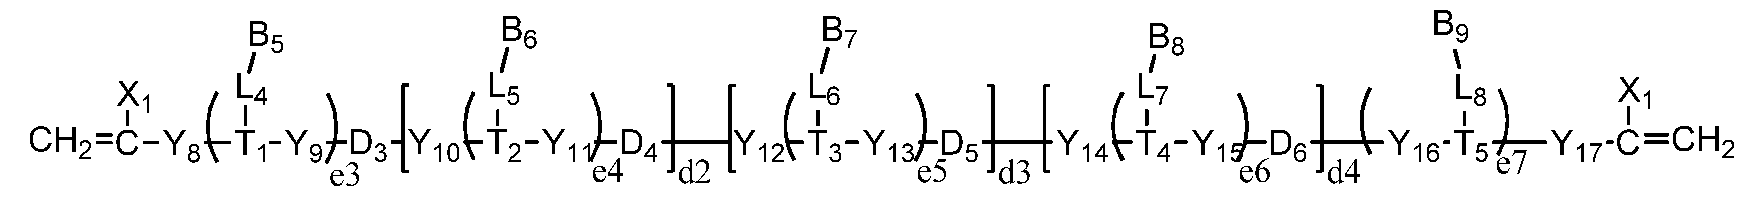 Figure 112015040048466-pct00040